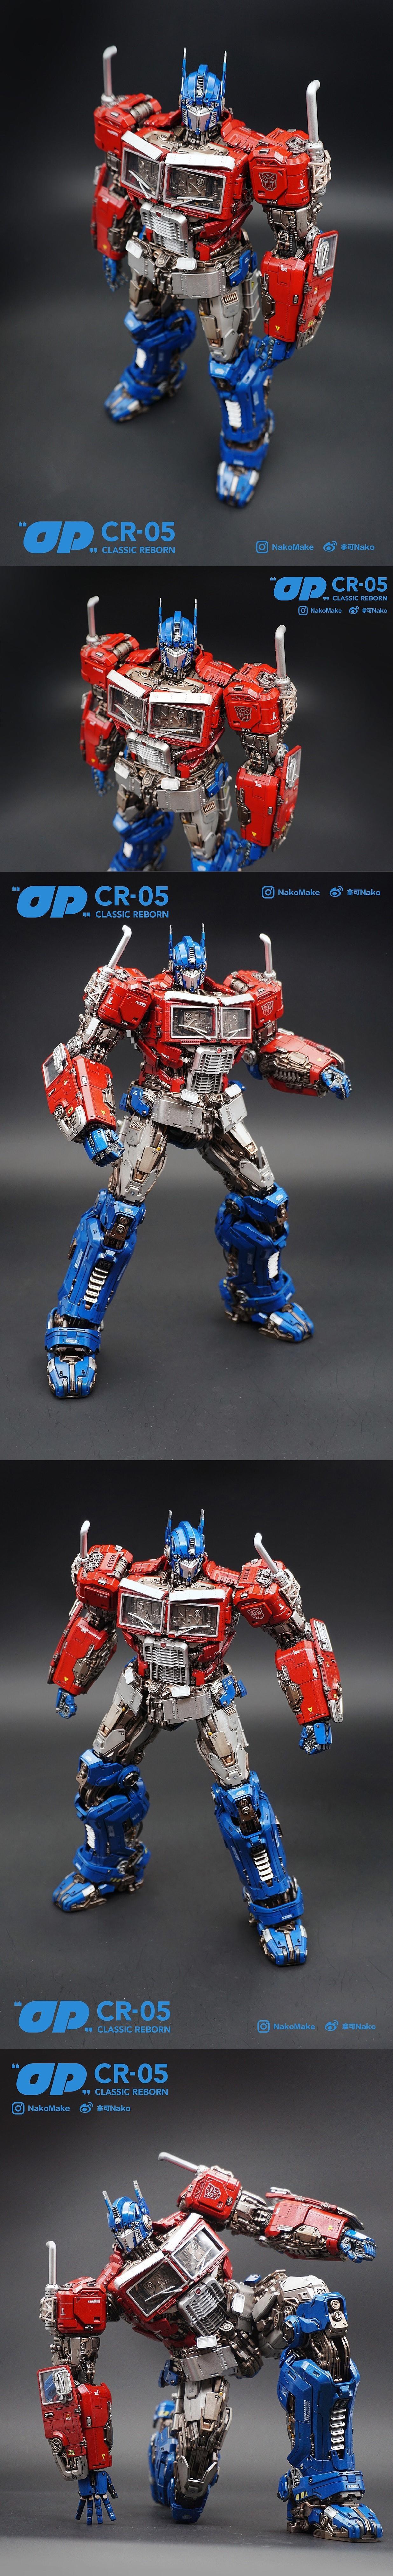 G798_NakoMake_Optimus_Prime_BUMBLEBEE_ver_GK_025_1.jpg